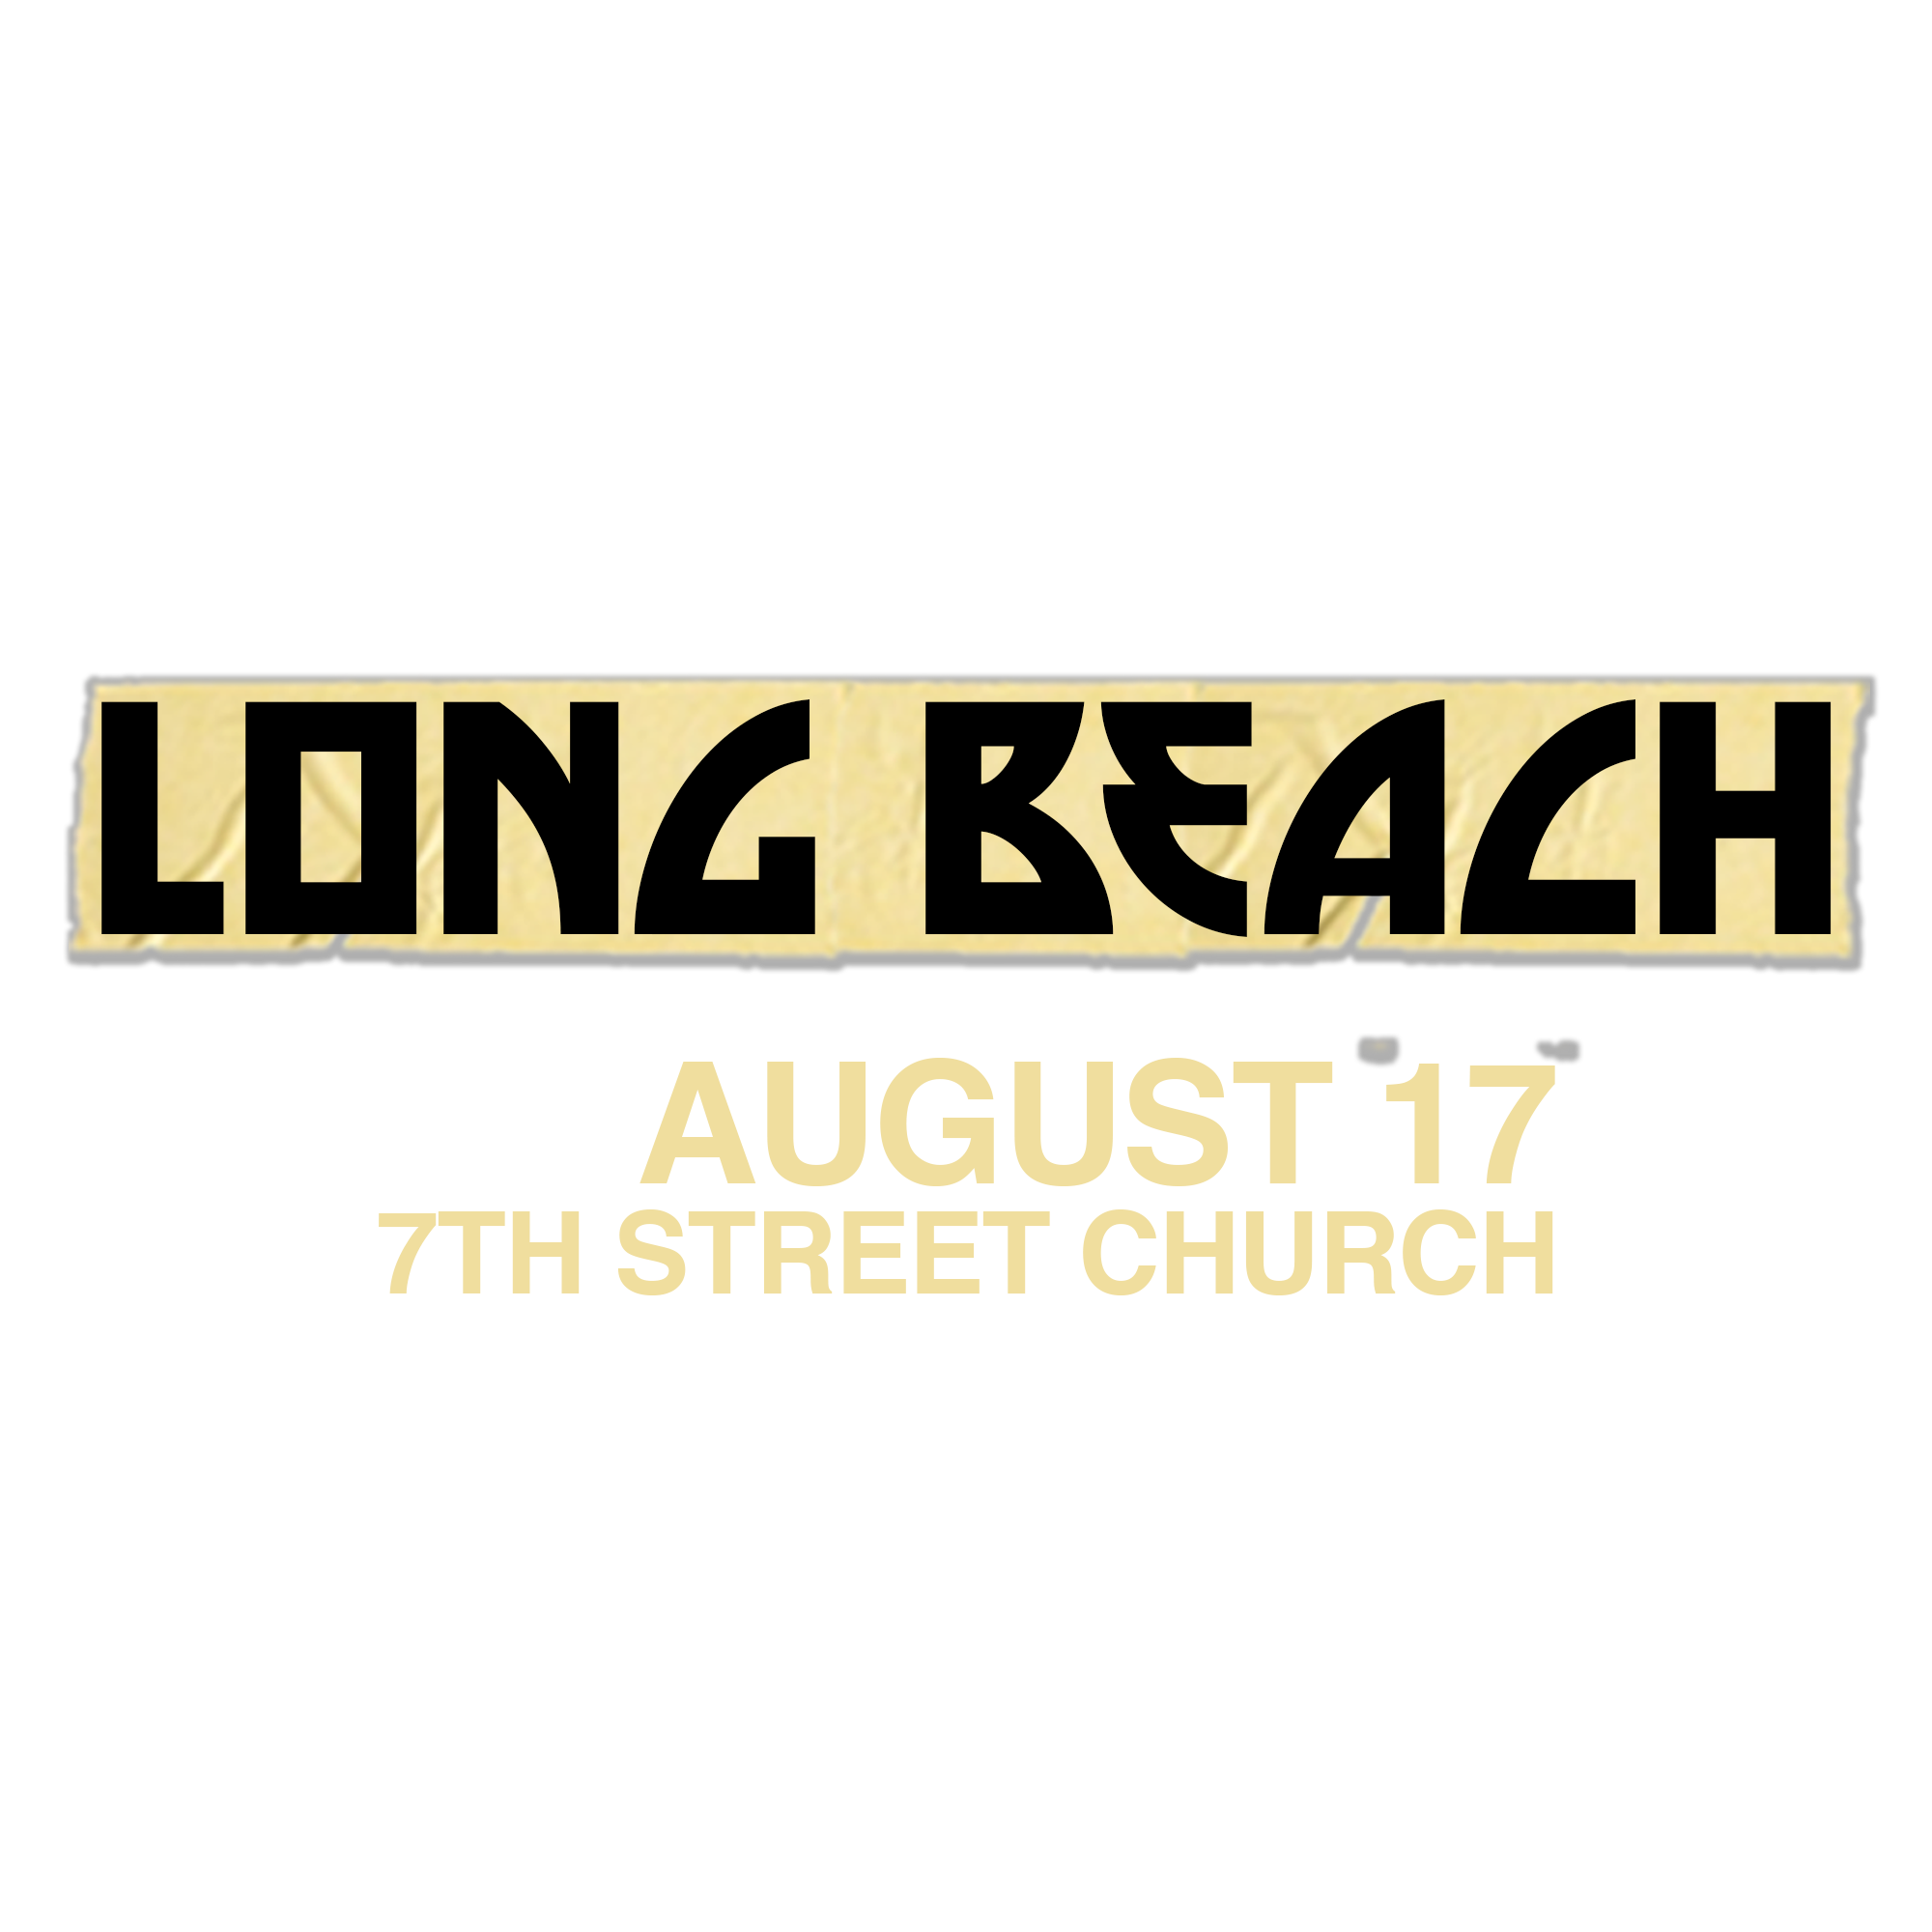 longbeach.png